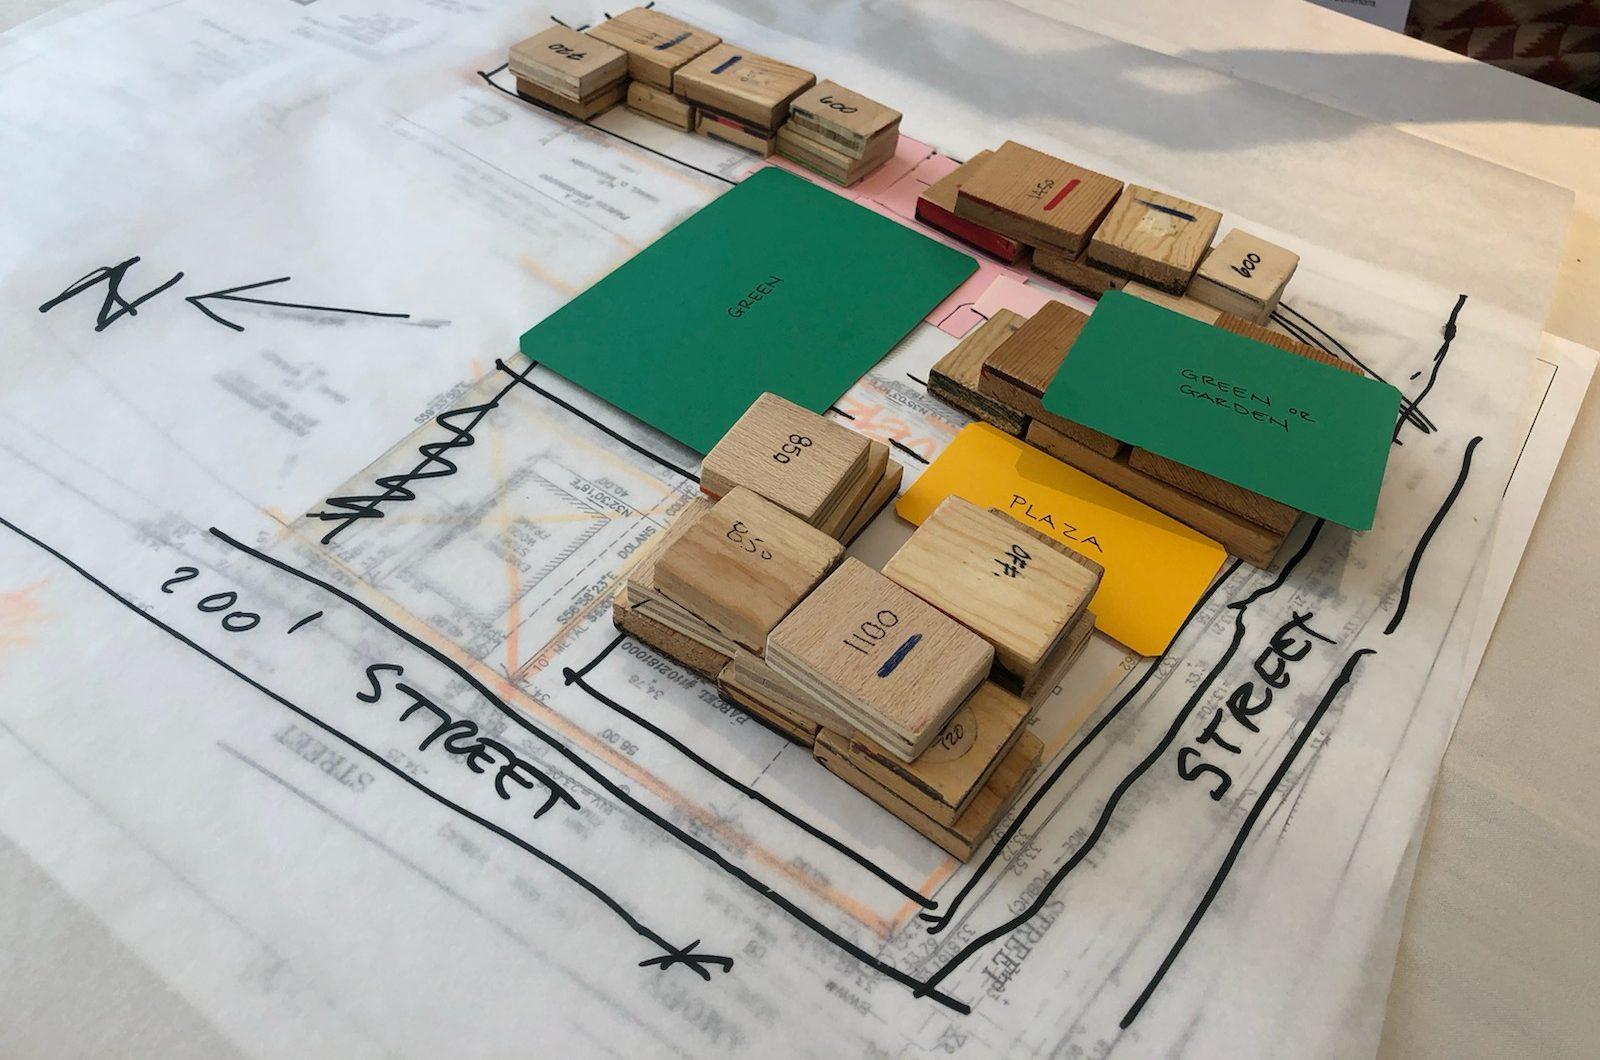 Cohousing Toronto